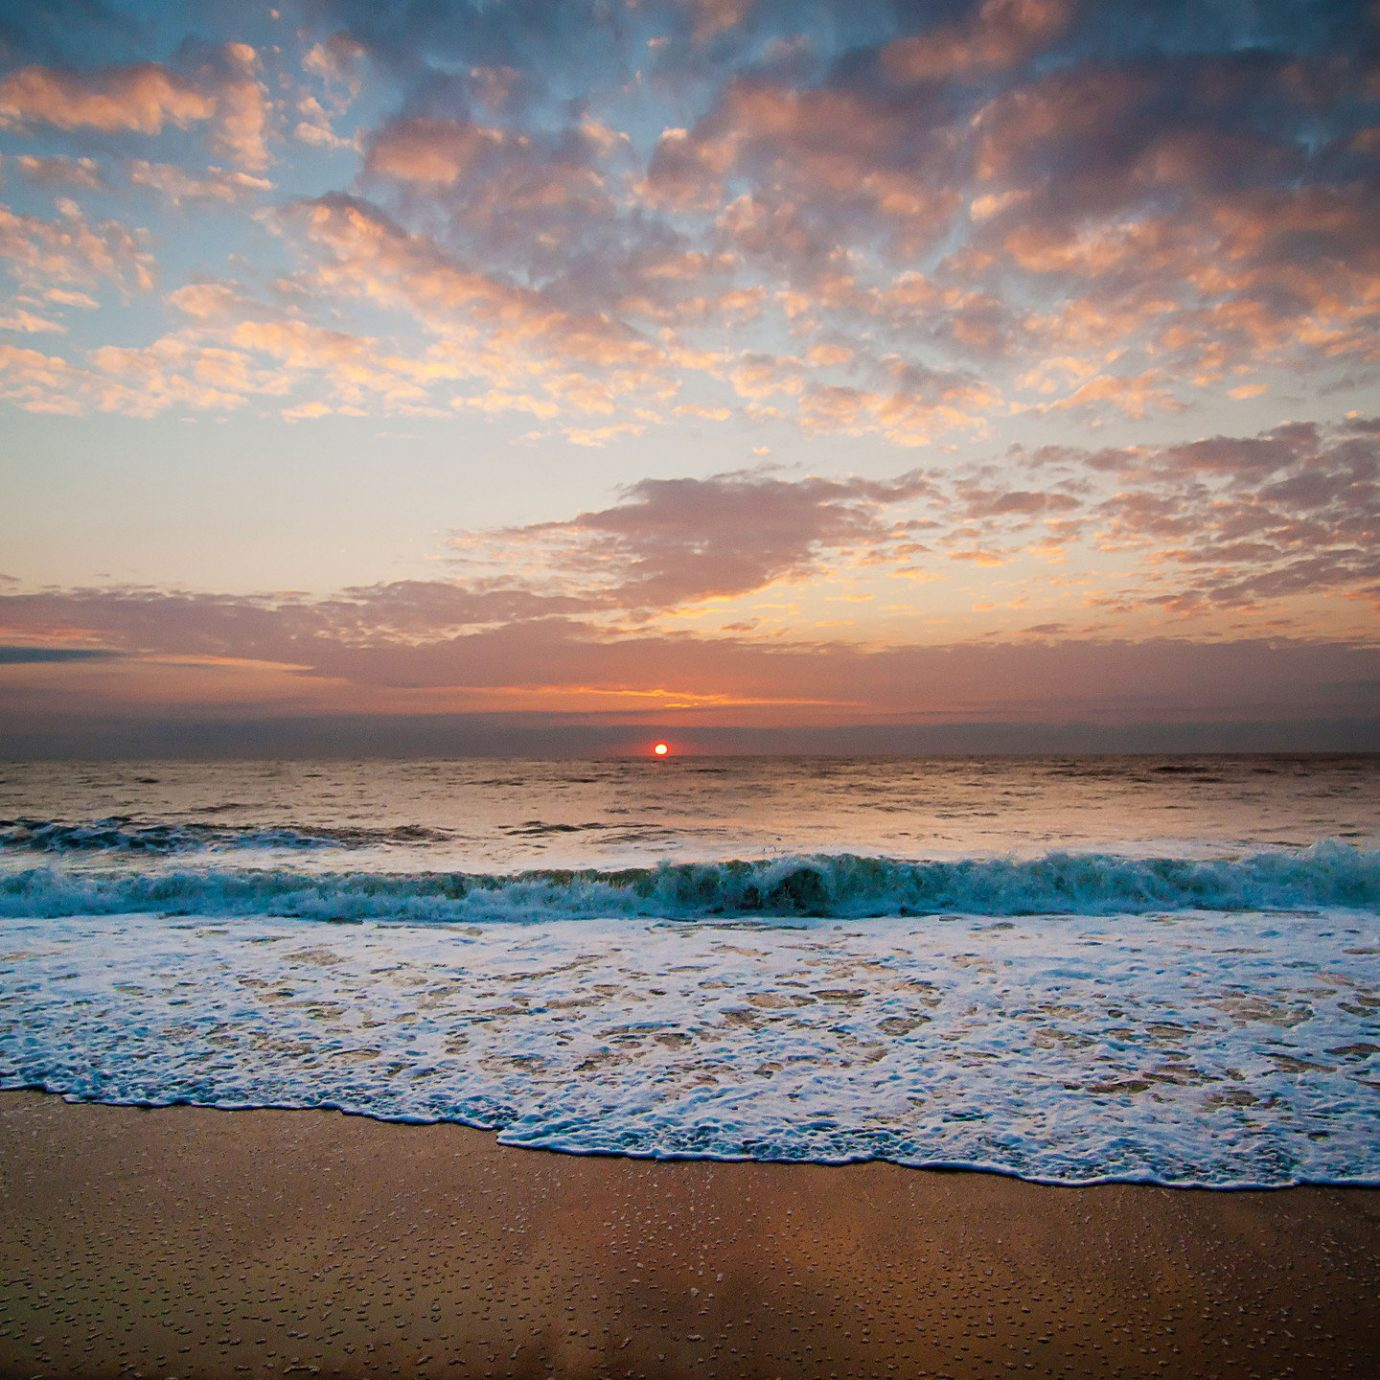 Romance Trip Ideas Weekend Getaways outdoor sky water Beach Sea cloud shore Ocean horizon Sunset body of water sunrise Nature Coast dawn wave morning wind wave afterglow evening dusk sunlight sand reflection Sun sandy